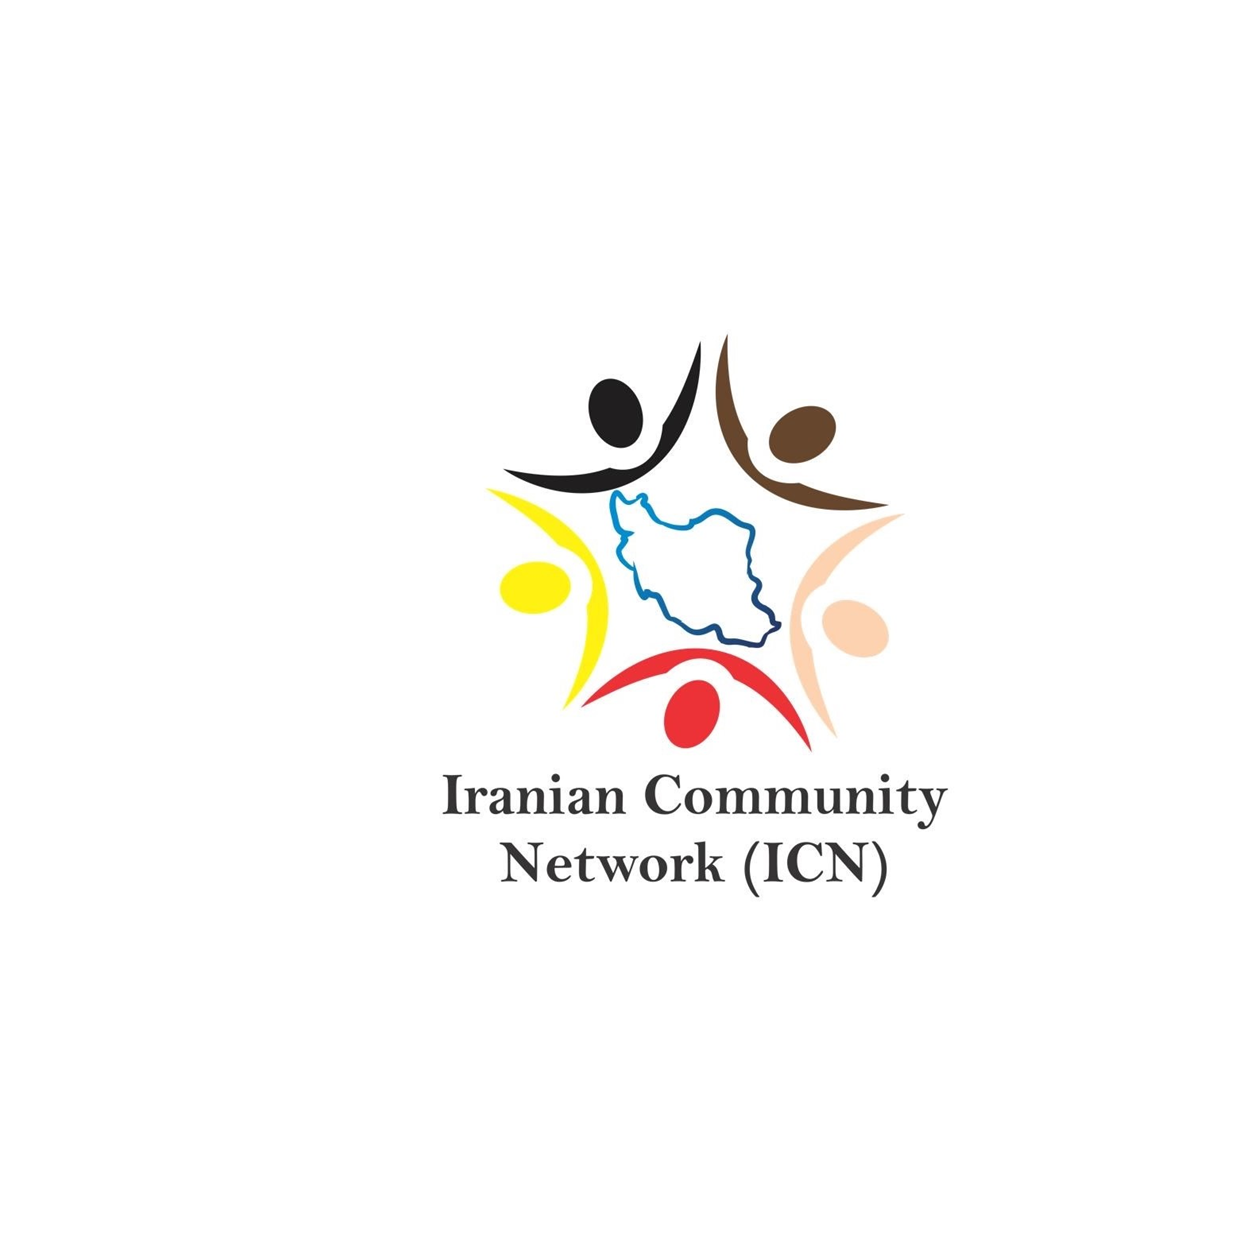 Iranian Community Network (ICN)